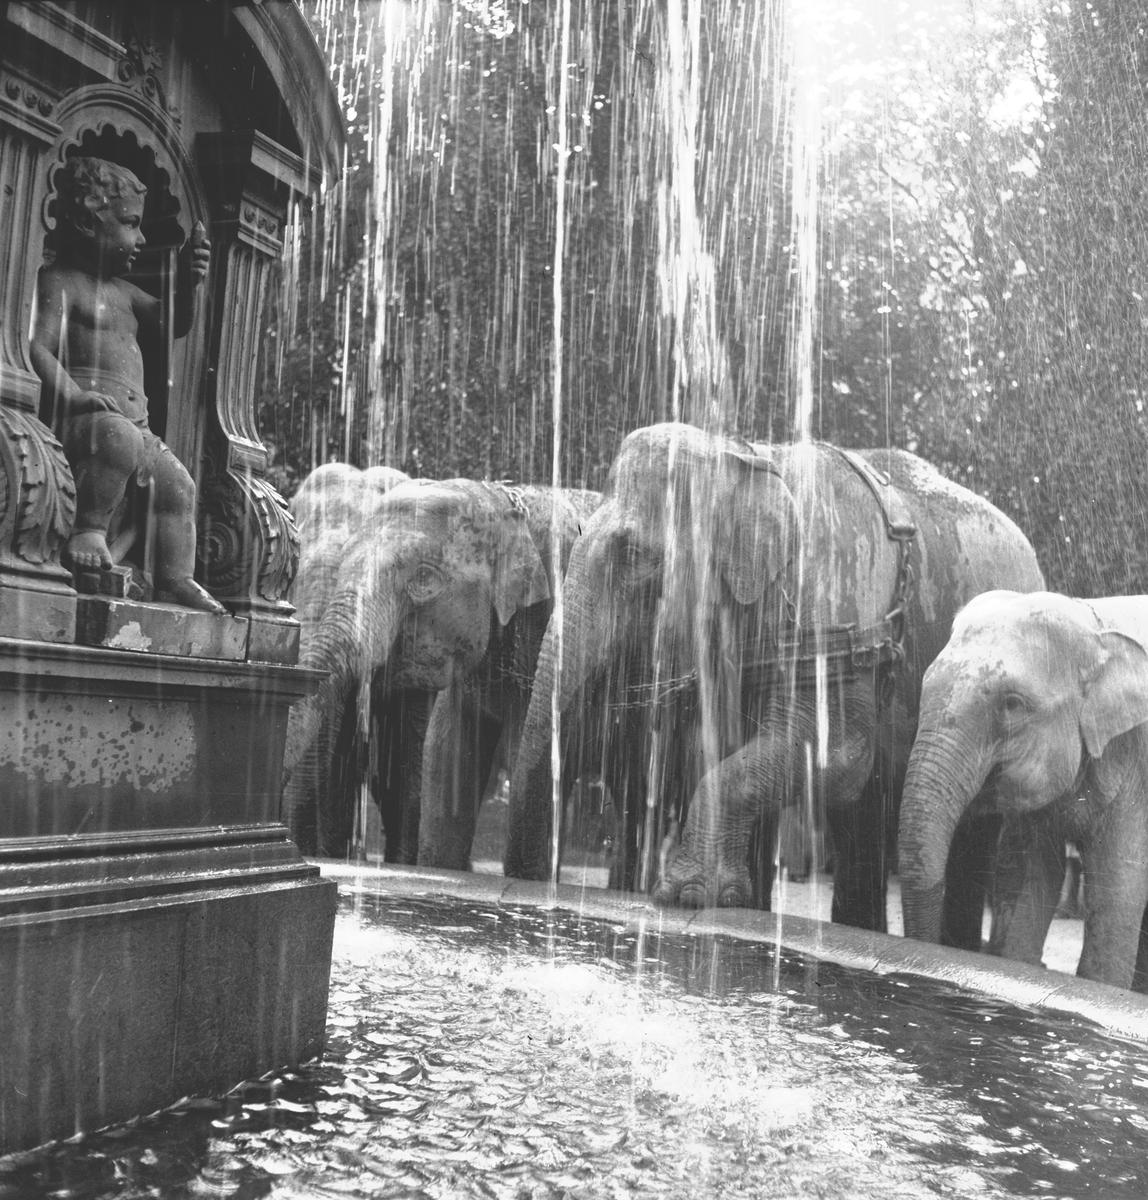 Cirkus Zoo, ankomst till stan. Augusti 1944